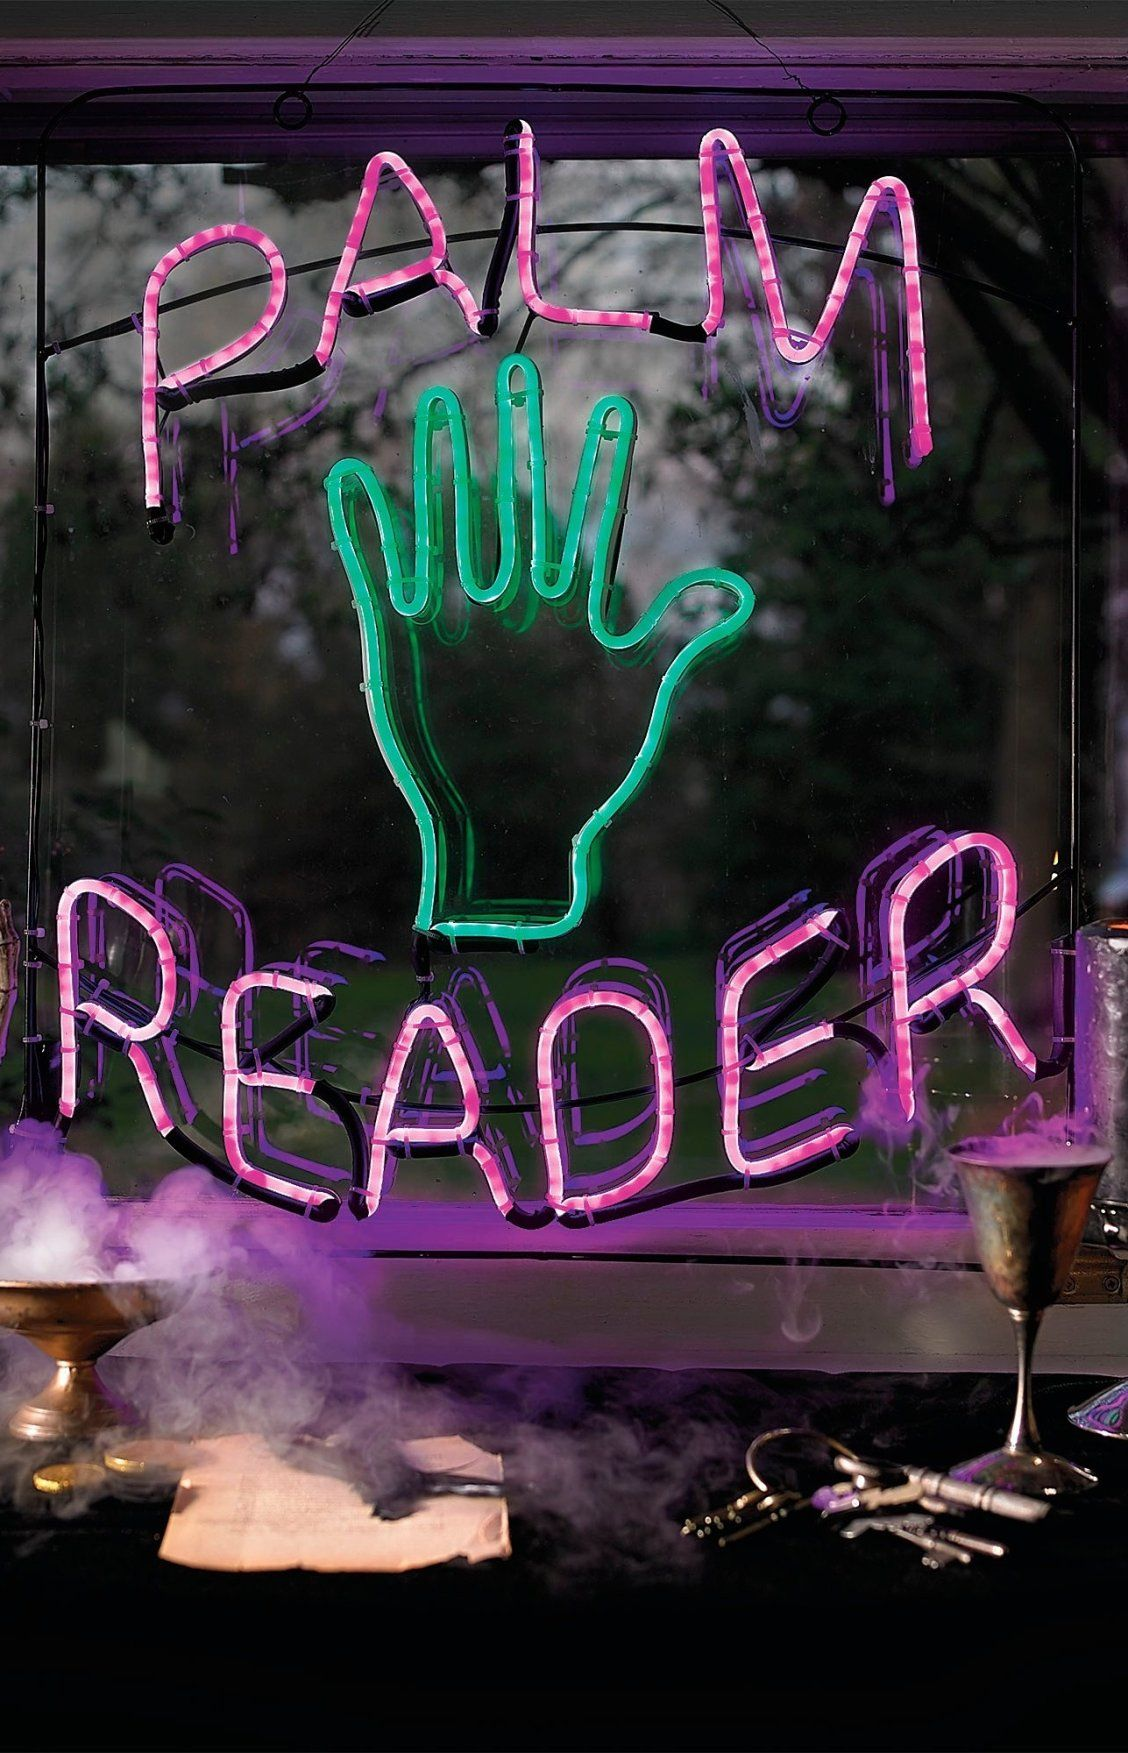 'Palm Reader' Neon Sign Grandin Road in 2020 Neon